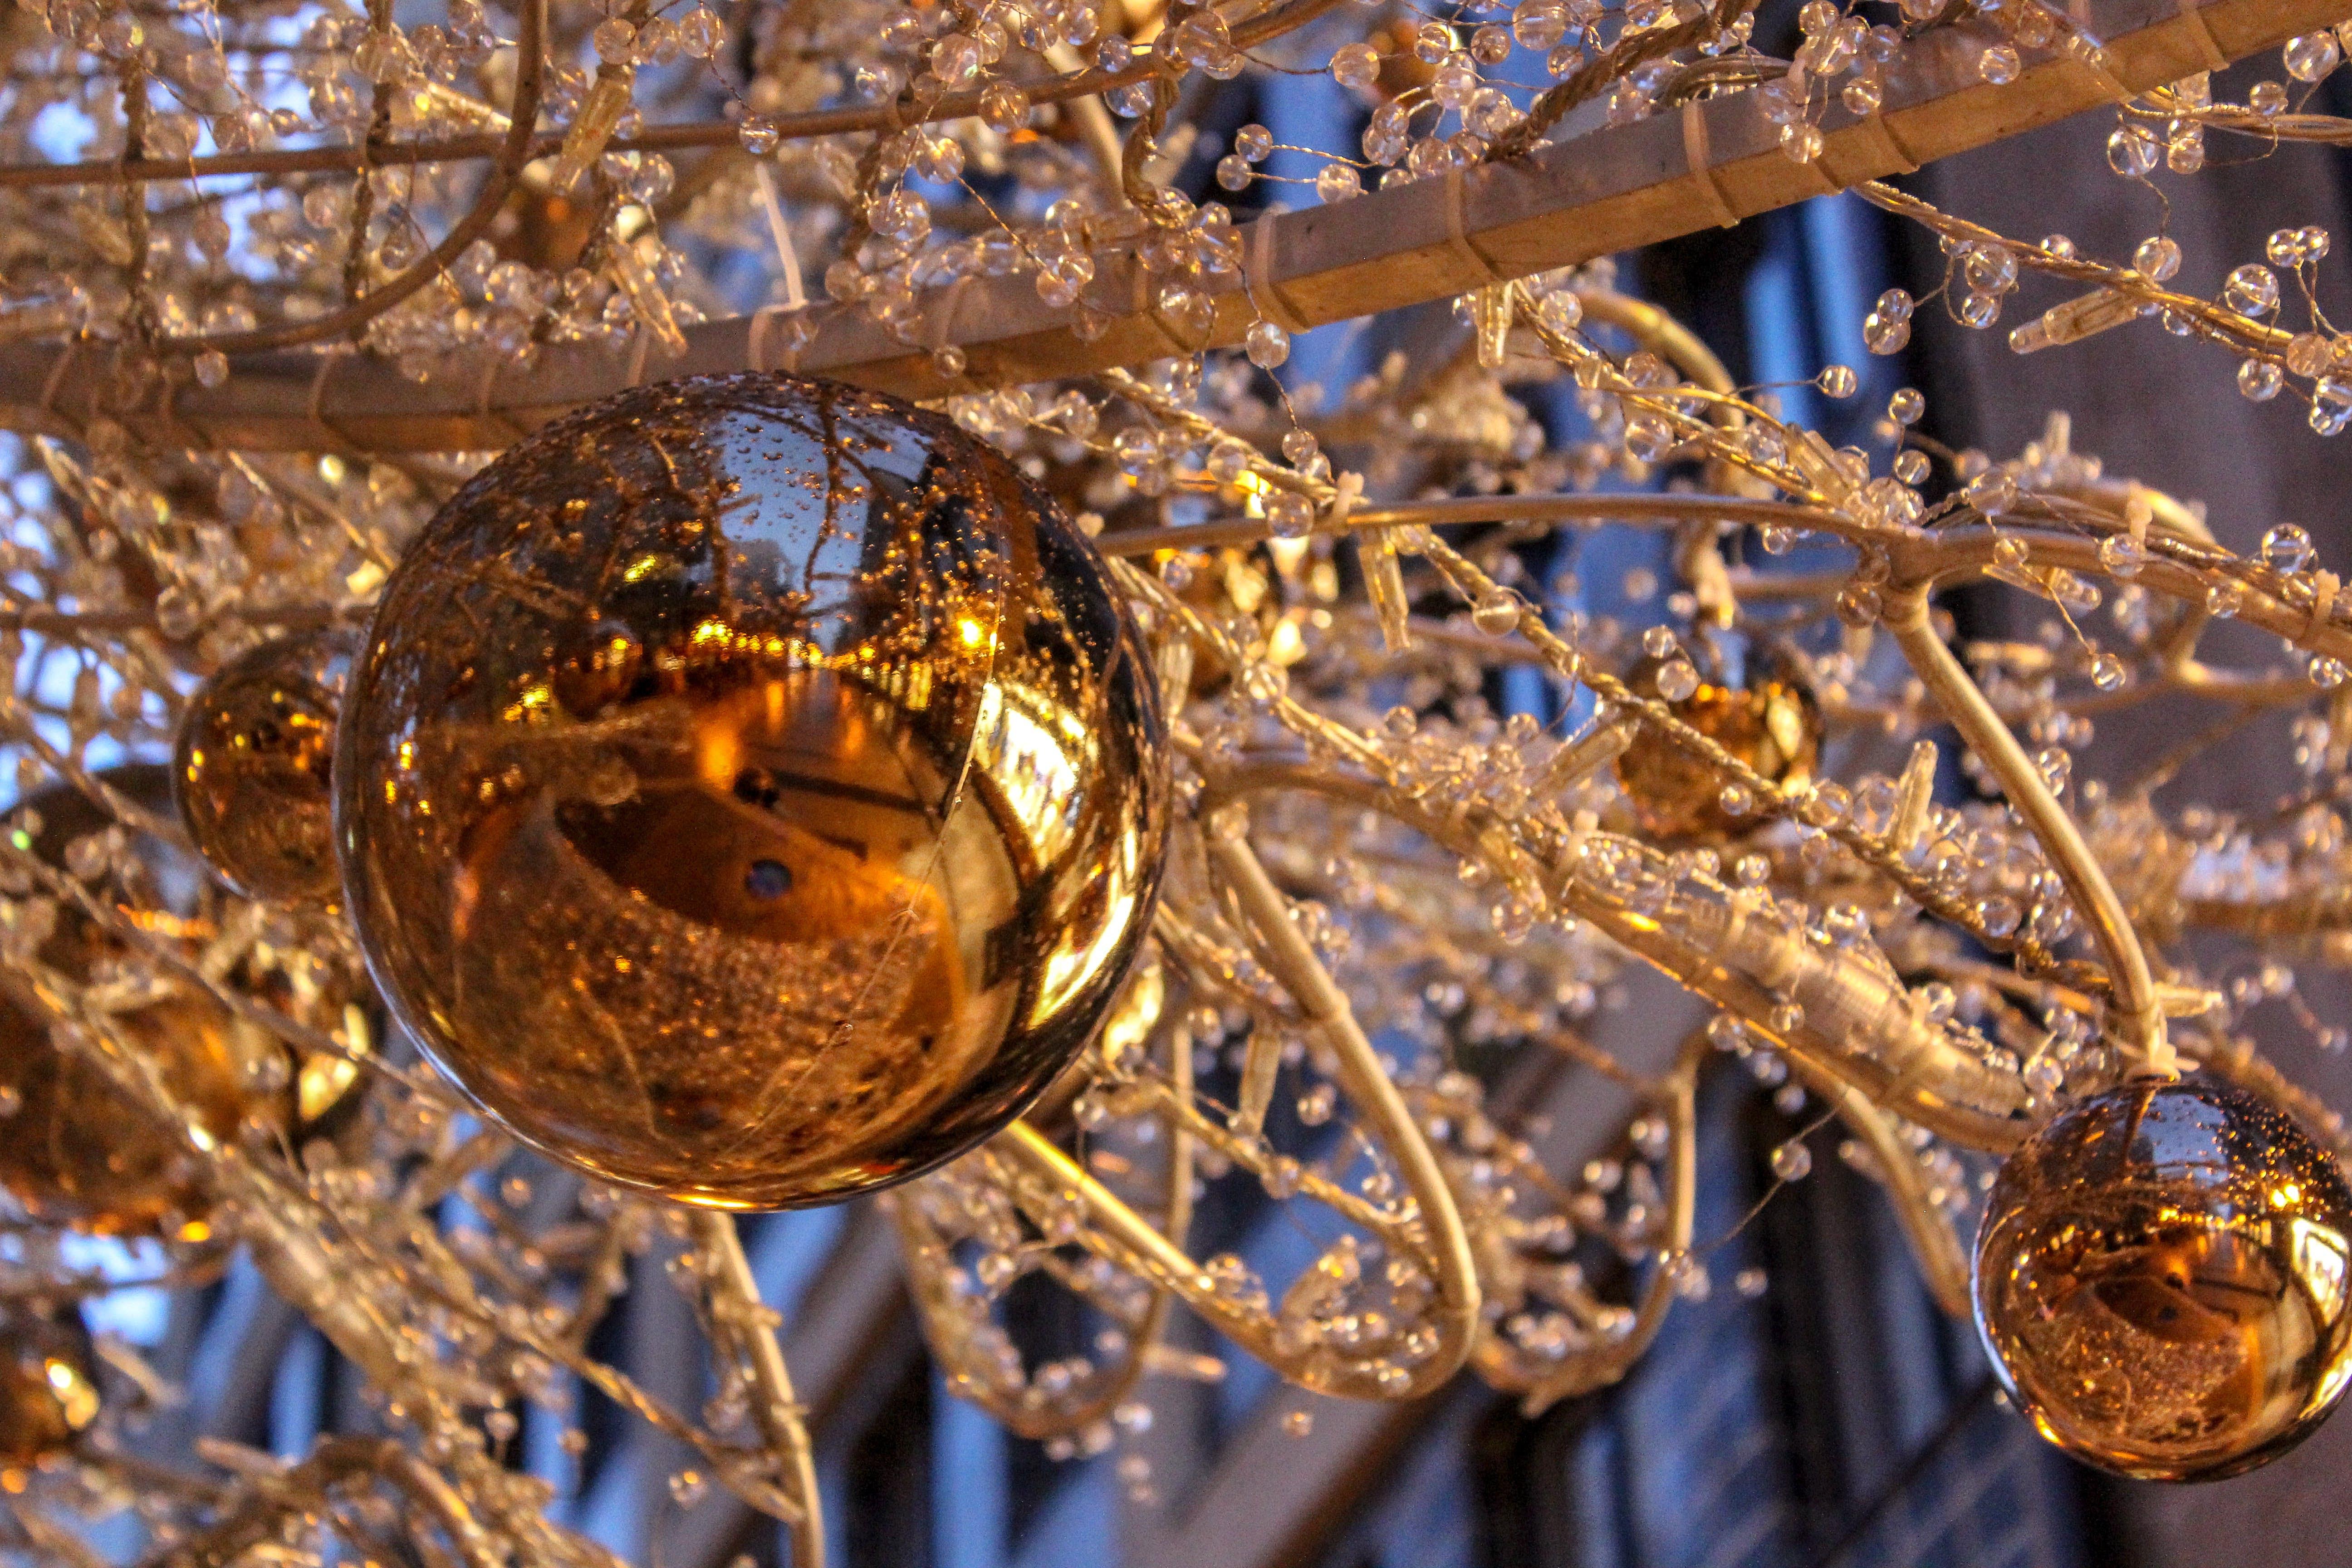 Free stock photo of #Christmas Tree#Budapest#Globe#Light